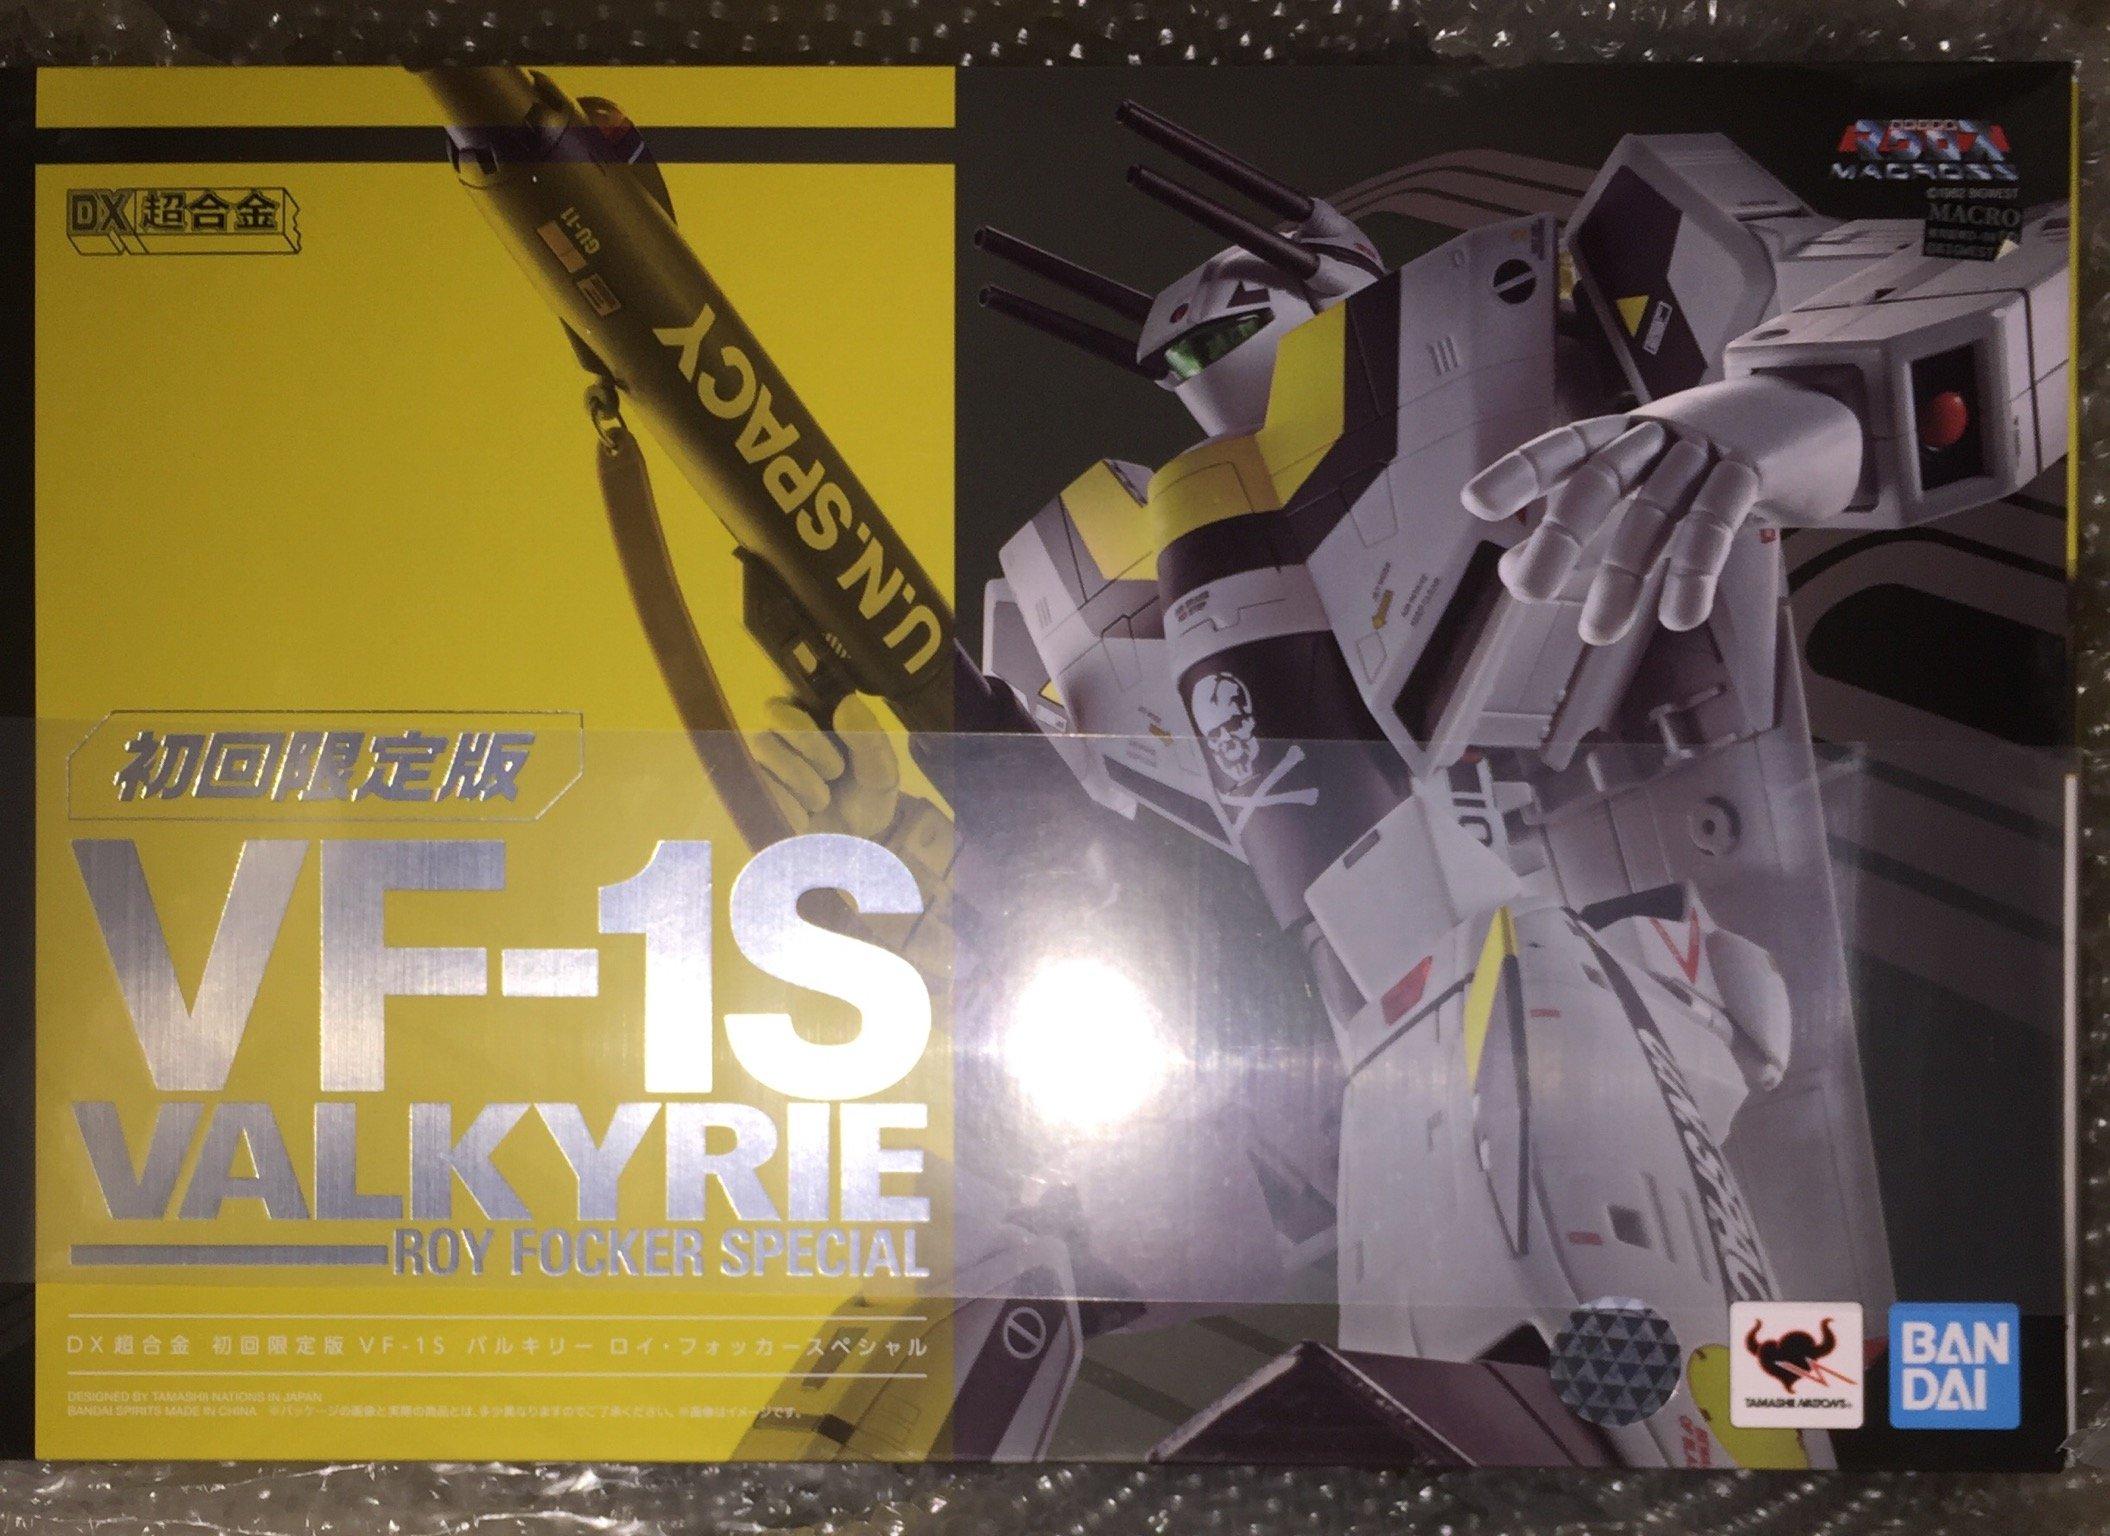 dxvf1sroy